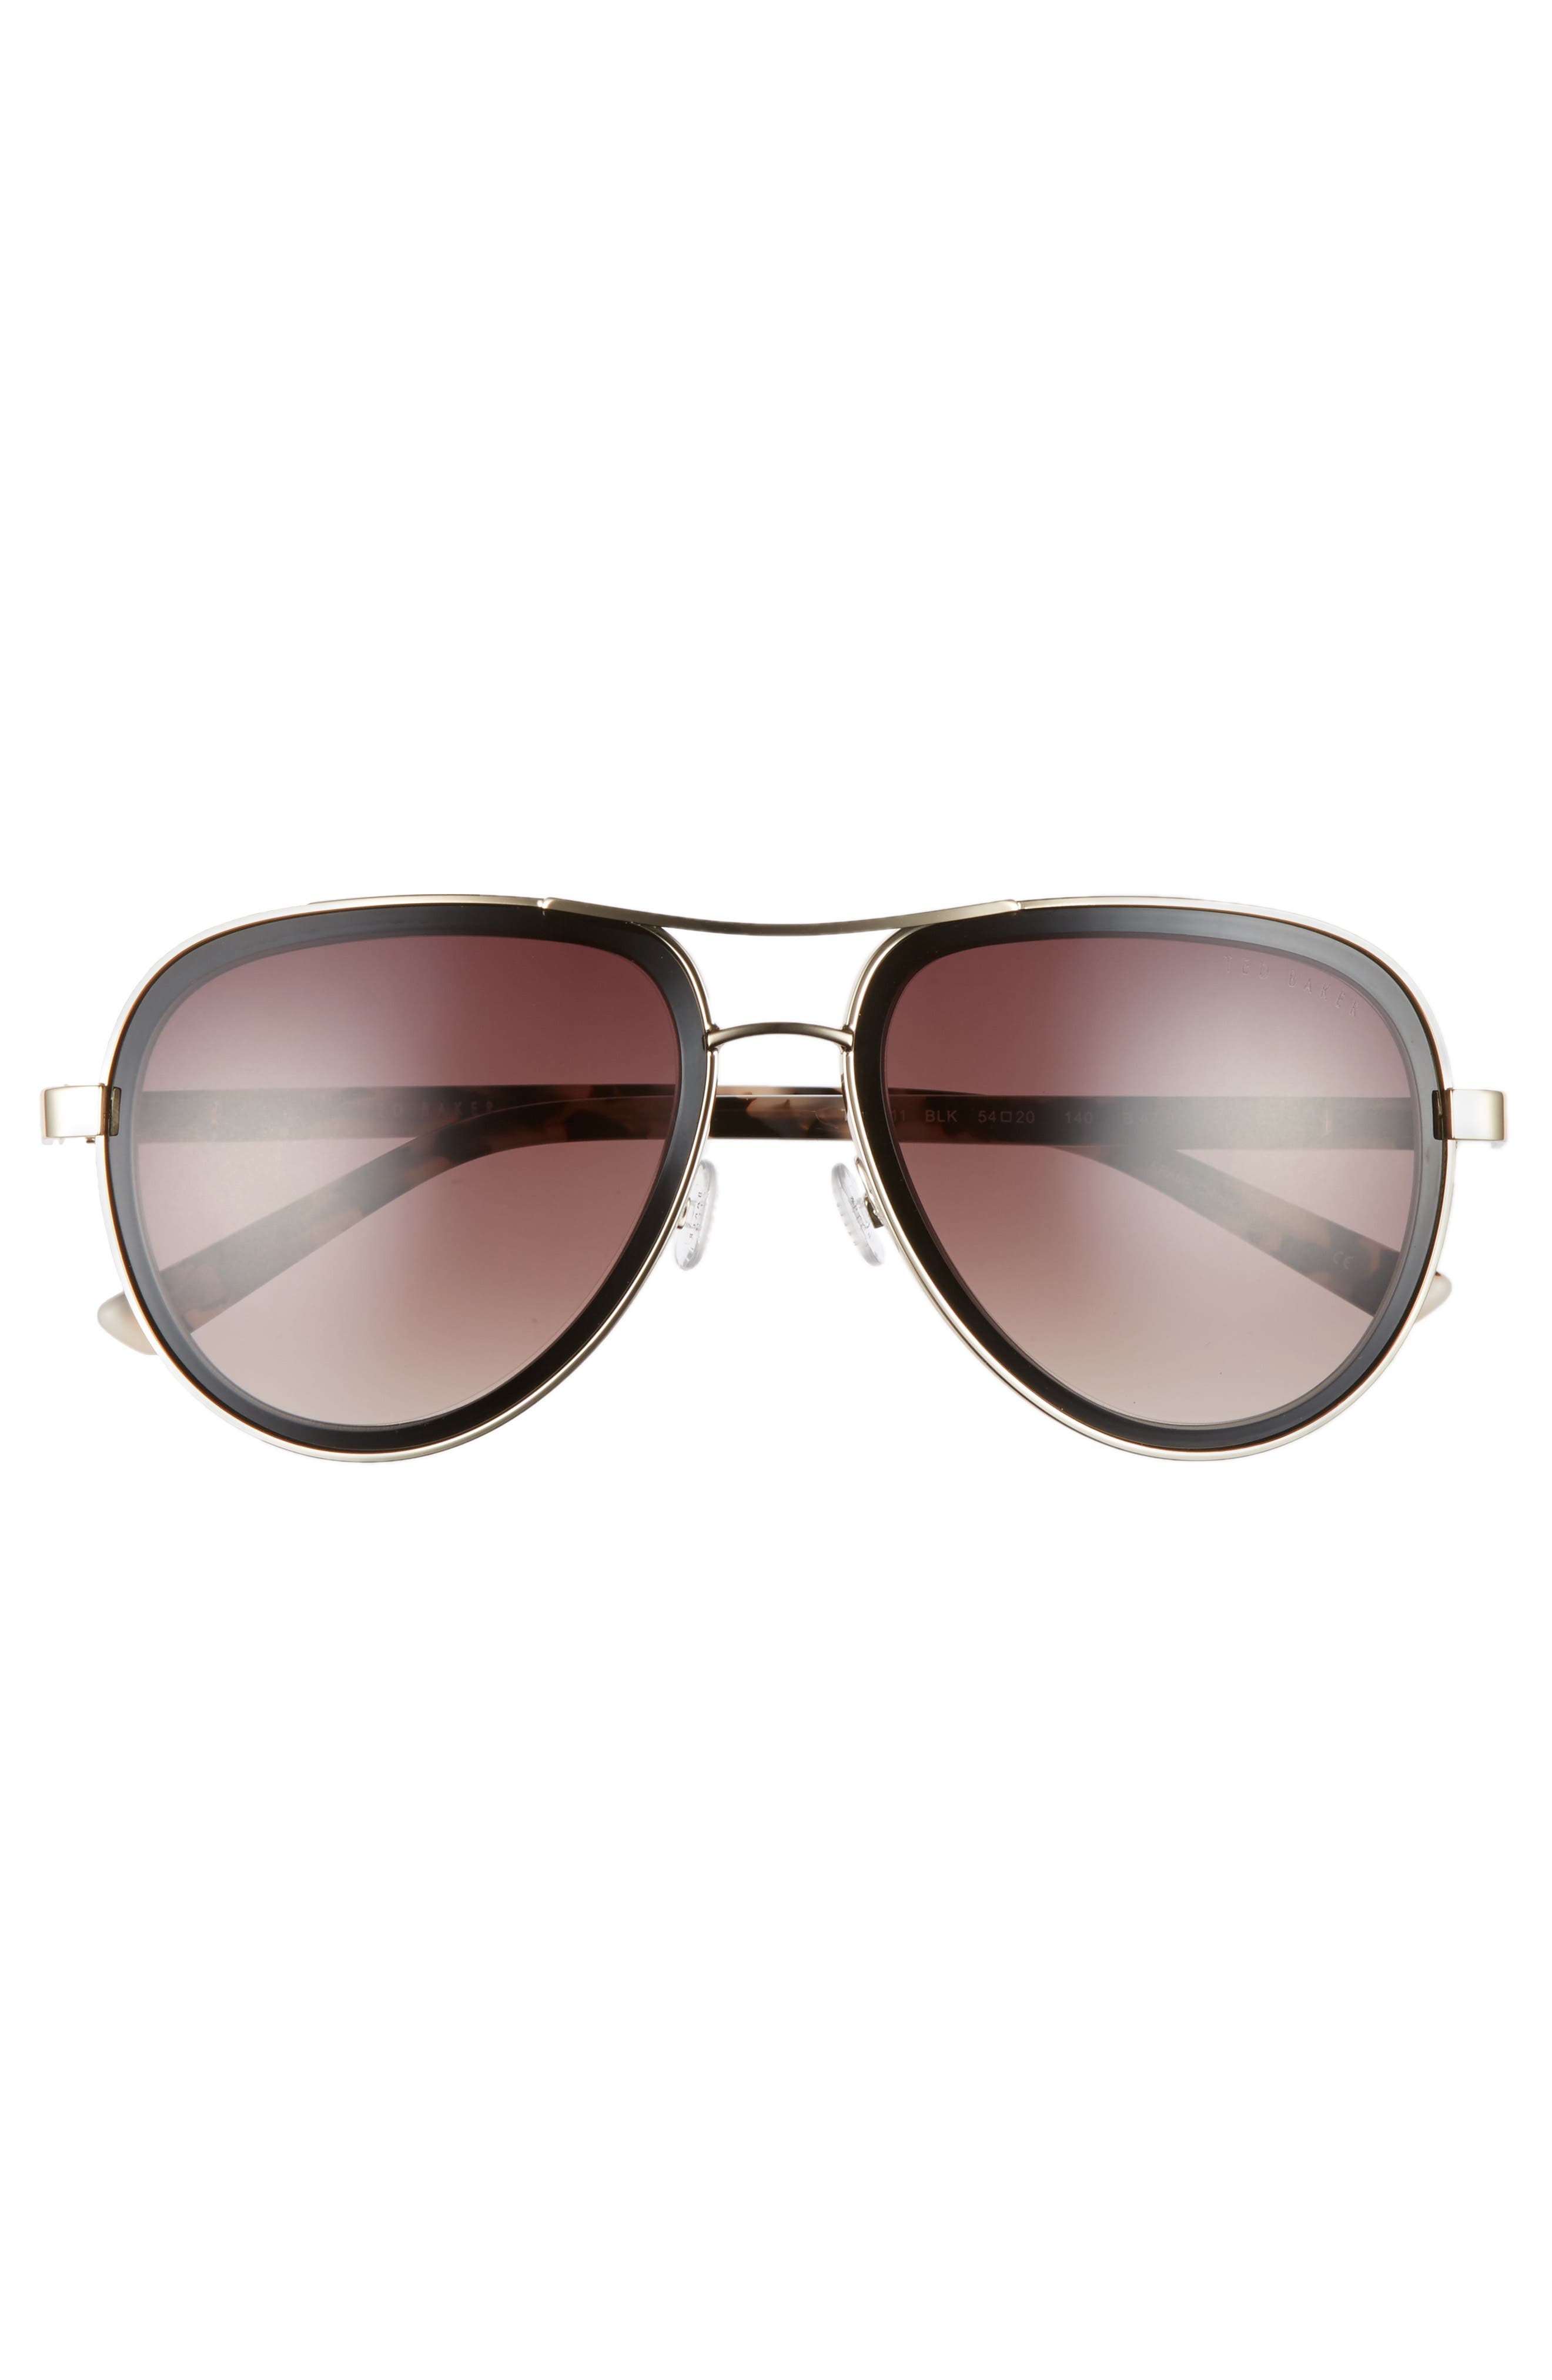 54mm Aviator Sunglasses,                             Alternate thumbnail 3, color,                             Black